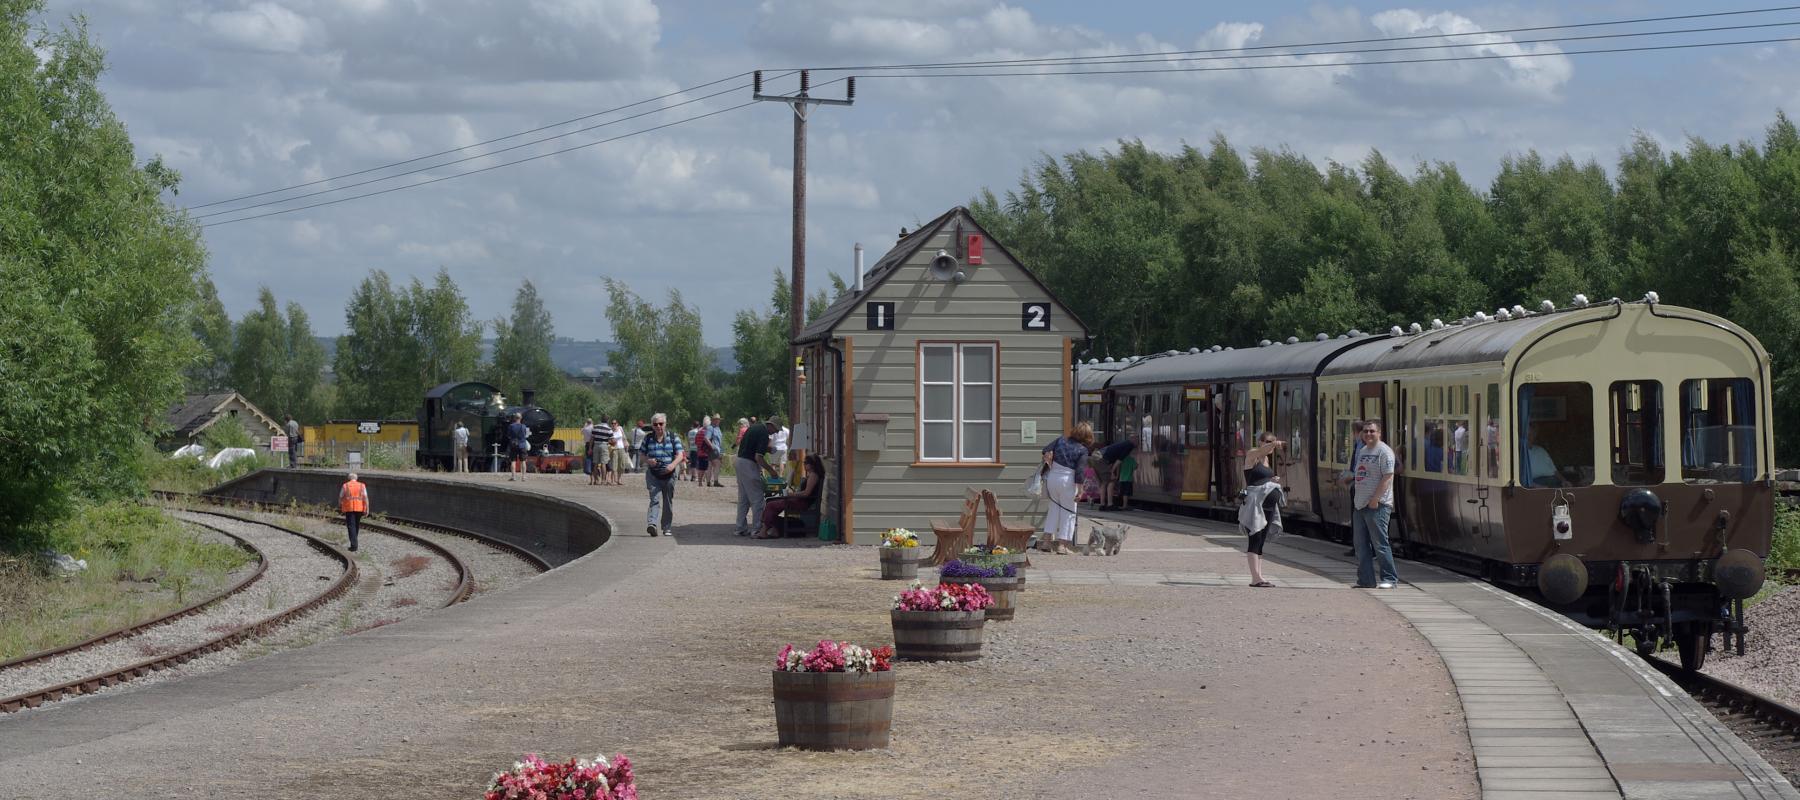 Lydney Junction Railway Station